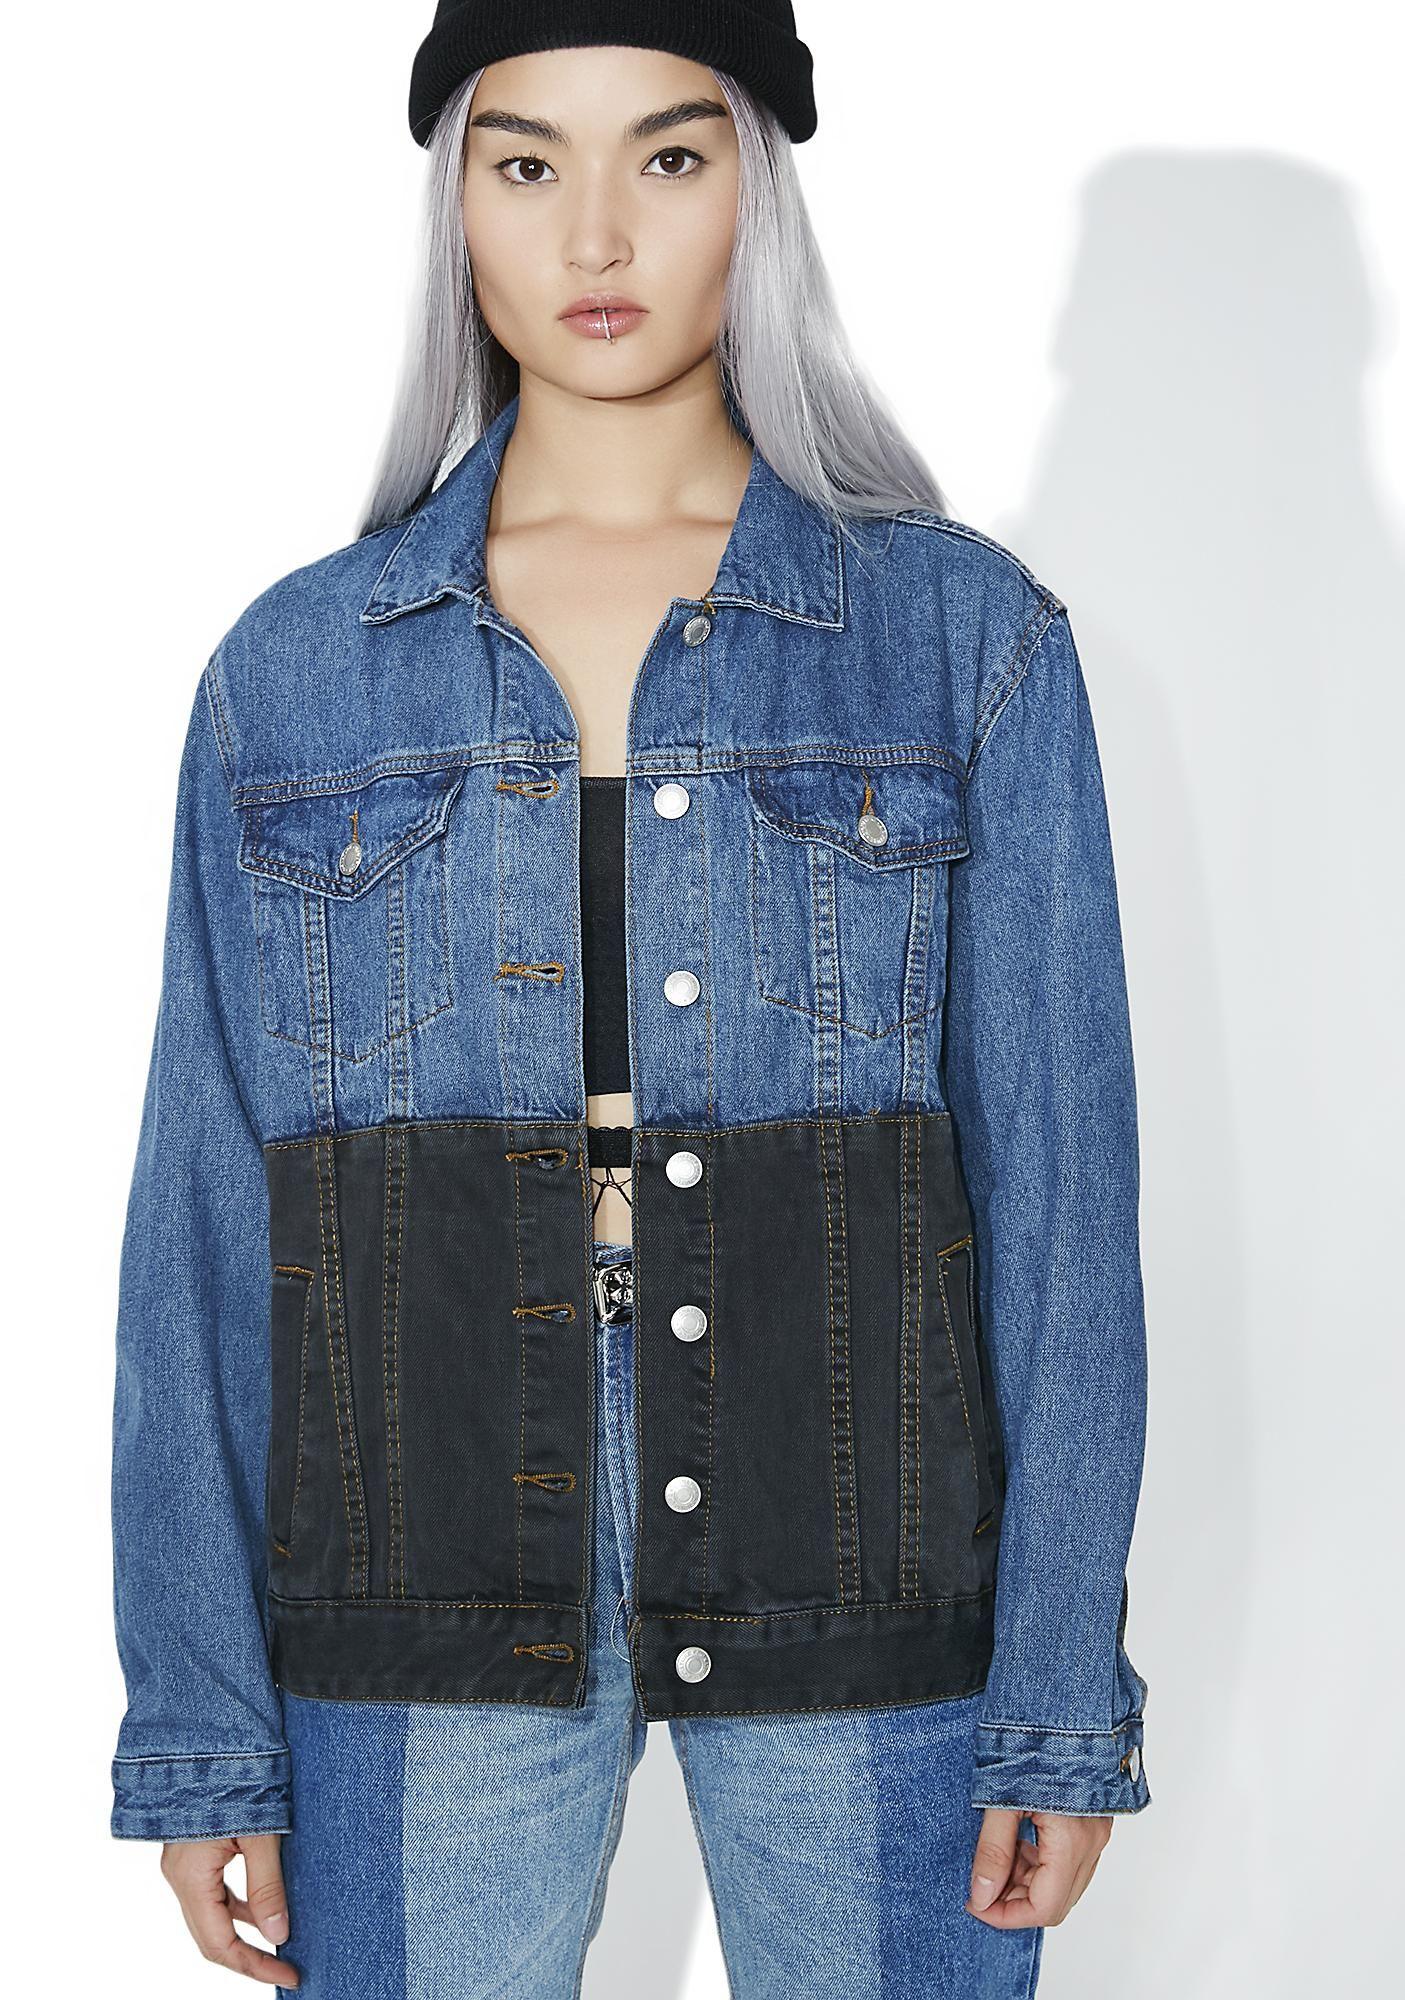 Black N Blue Denim Jacket Blue Denim Jacket Denim Jacket Jackets